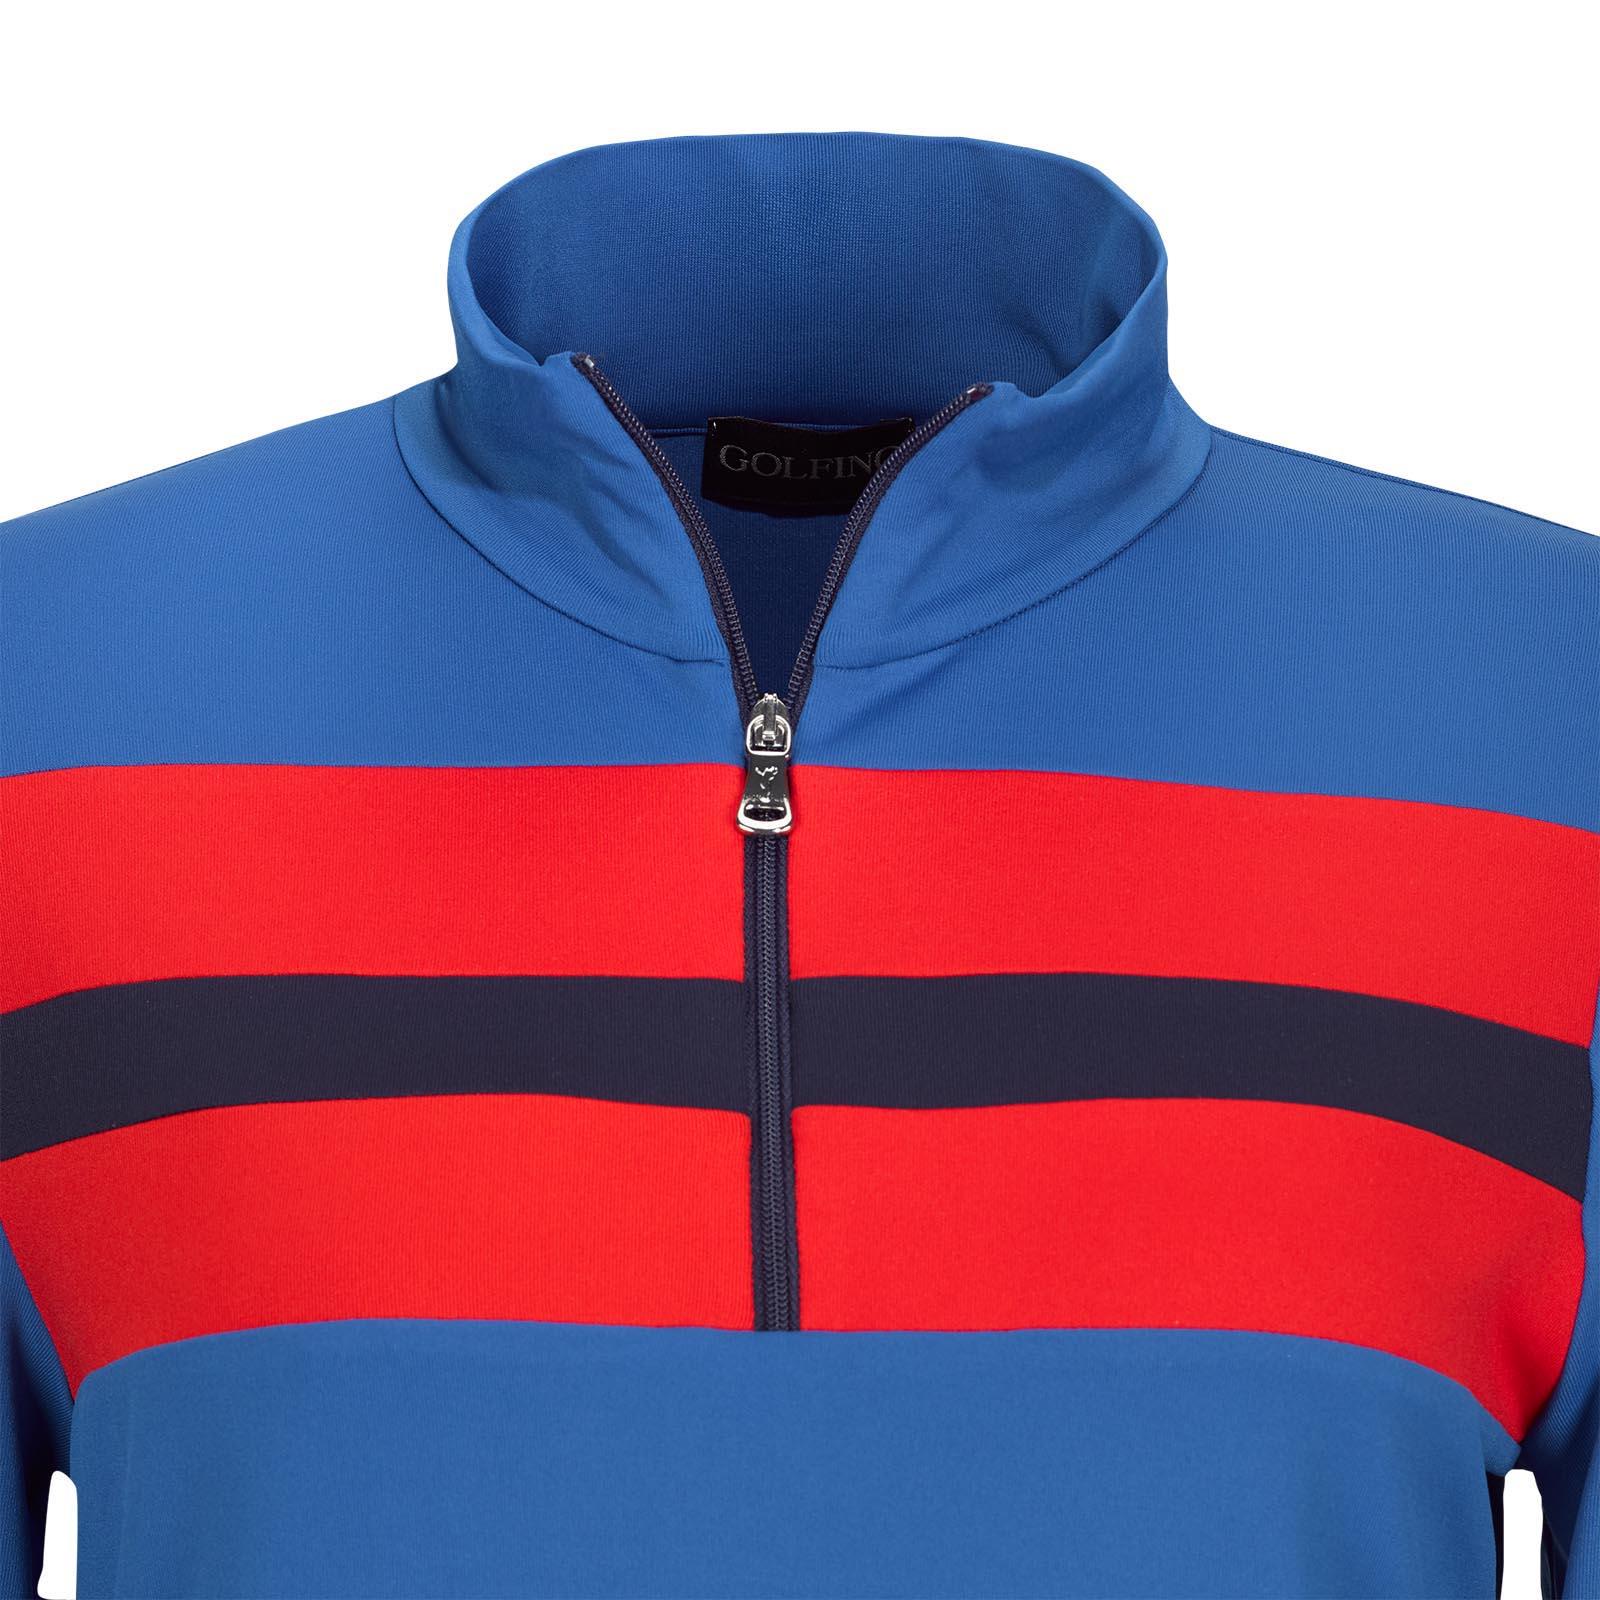 Damen Longsleeve Retro Sport Golf-Troyer Dry Comfort in Slim Fit